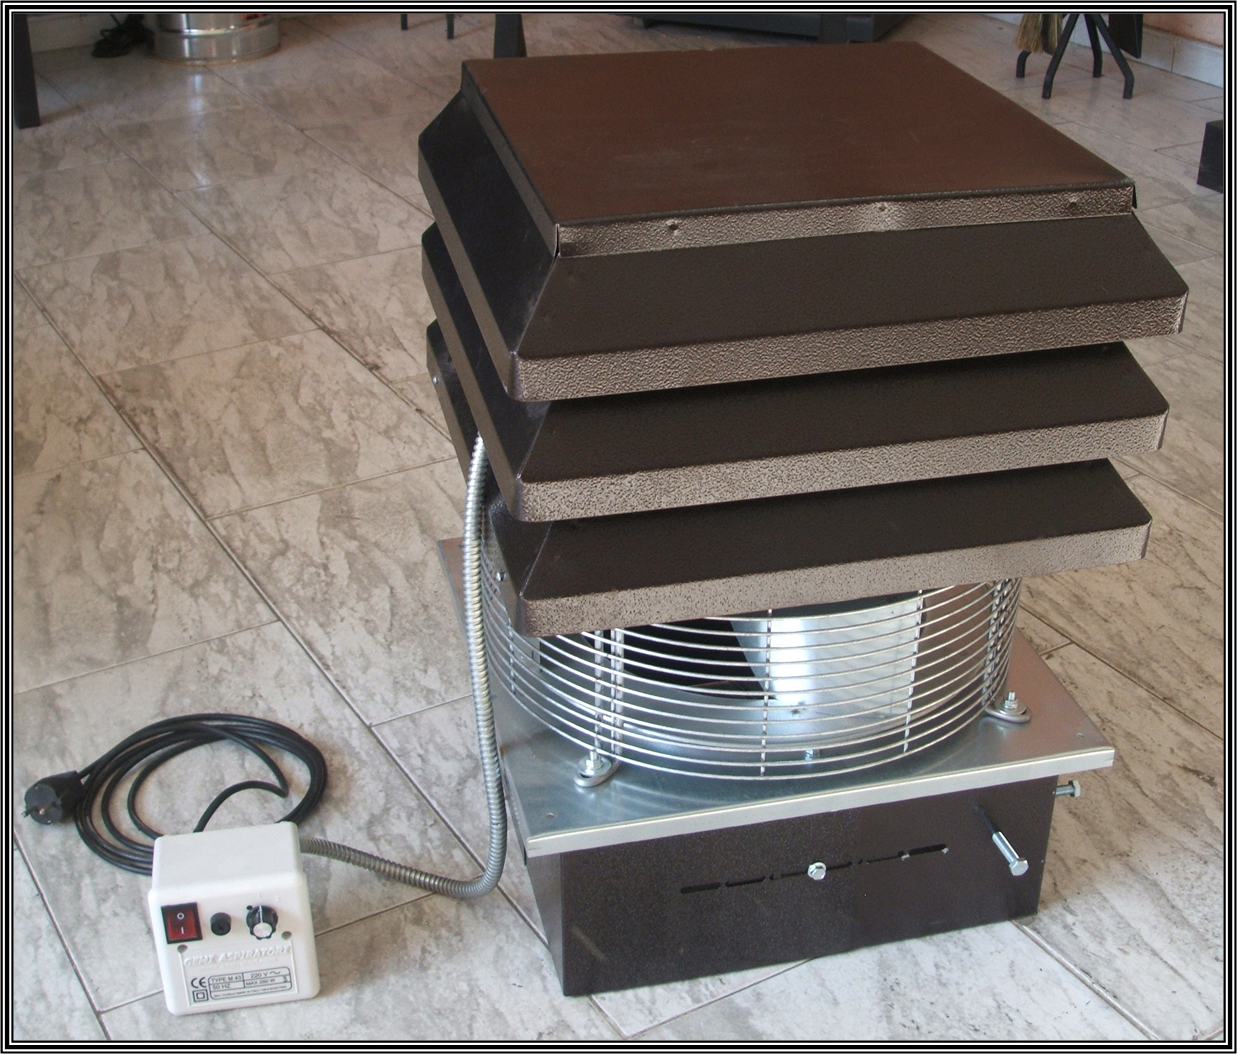 Chimeneas sierra aspirador de humo para chimeneas - Accesorios para chimeneas decorativas ...